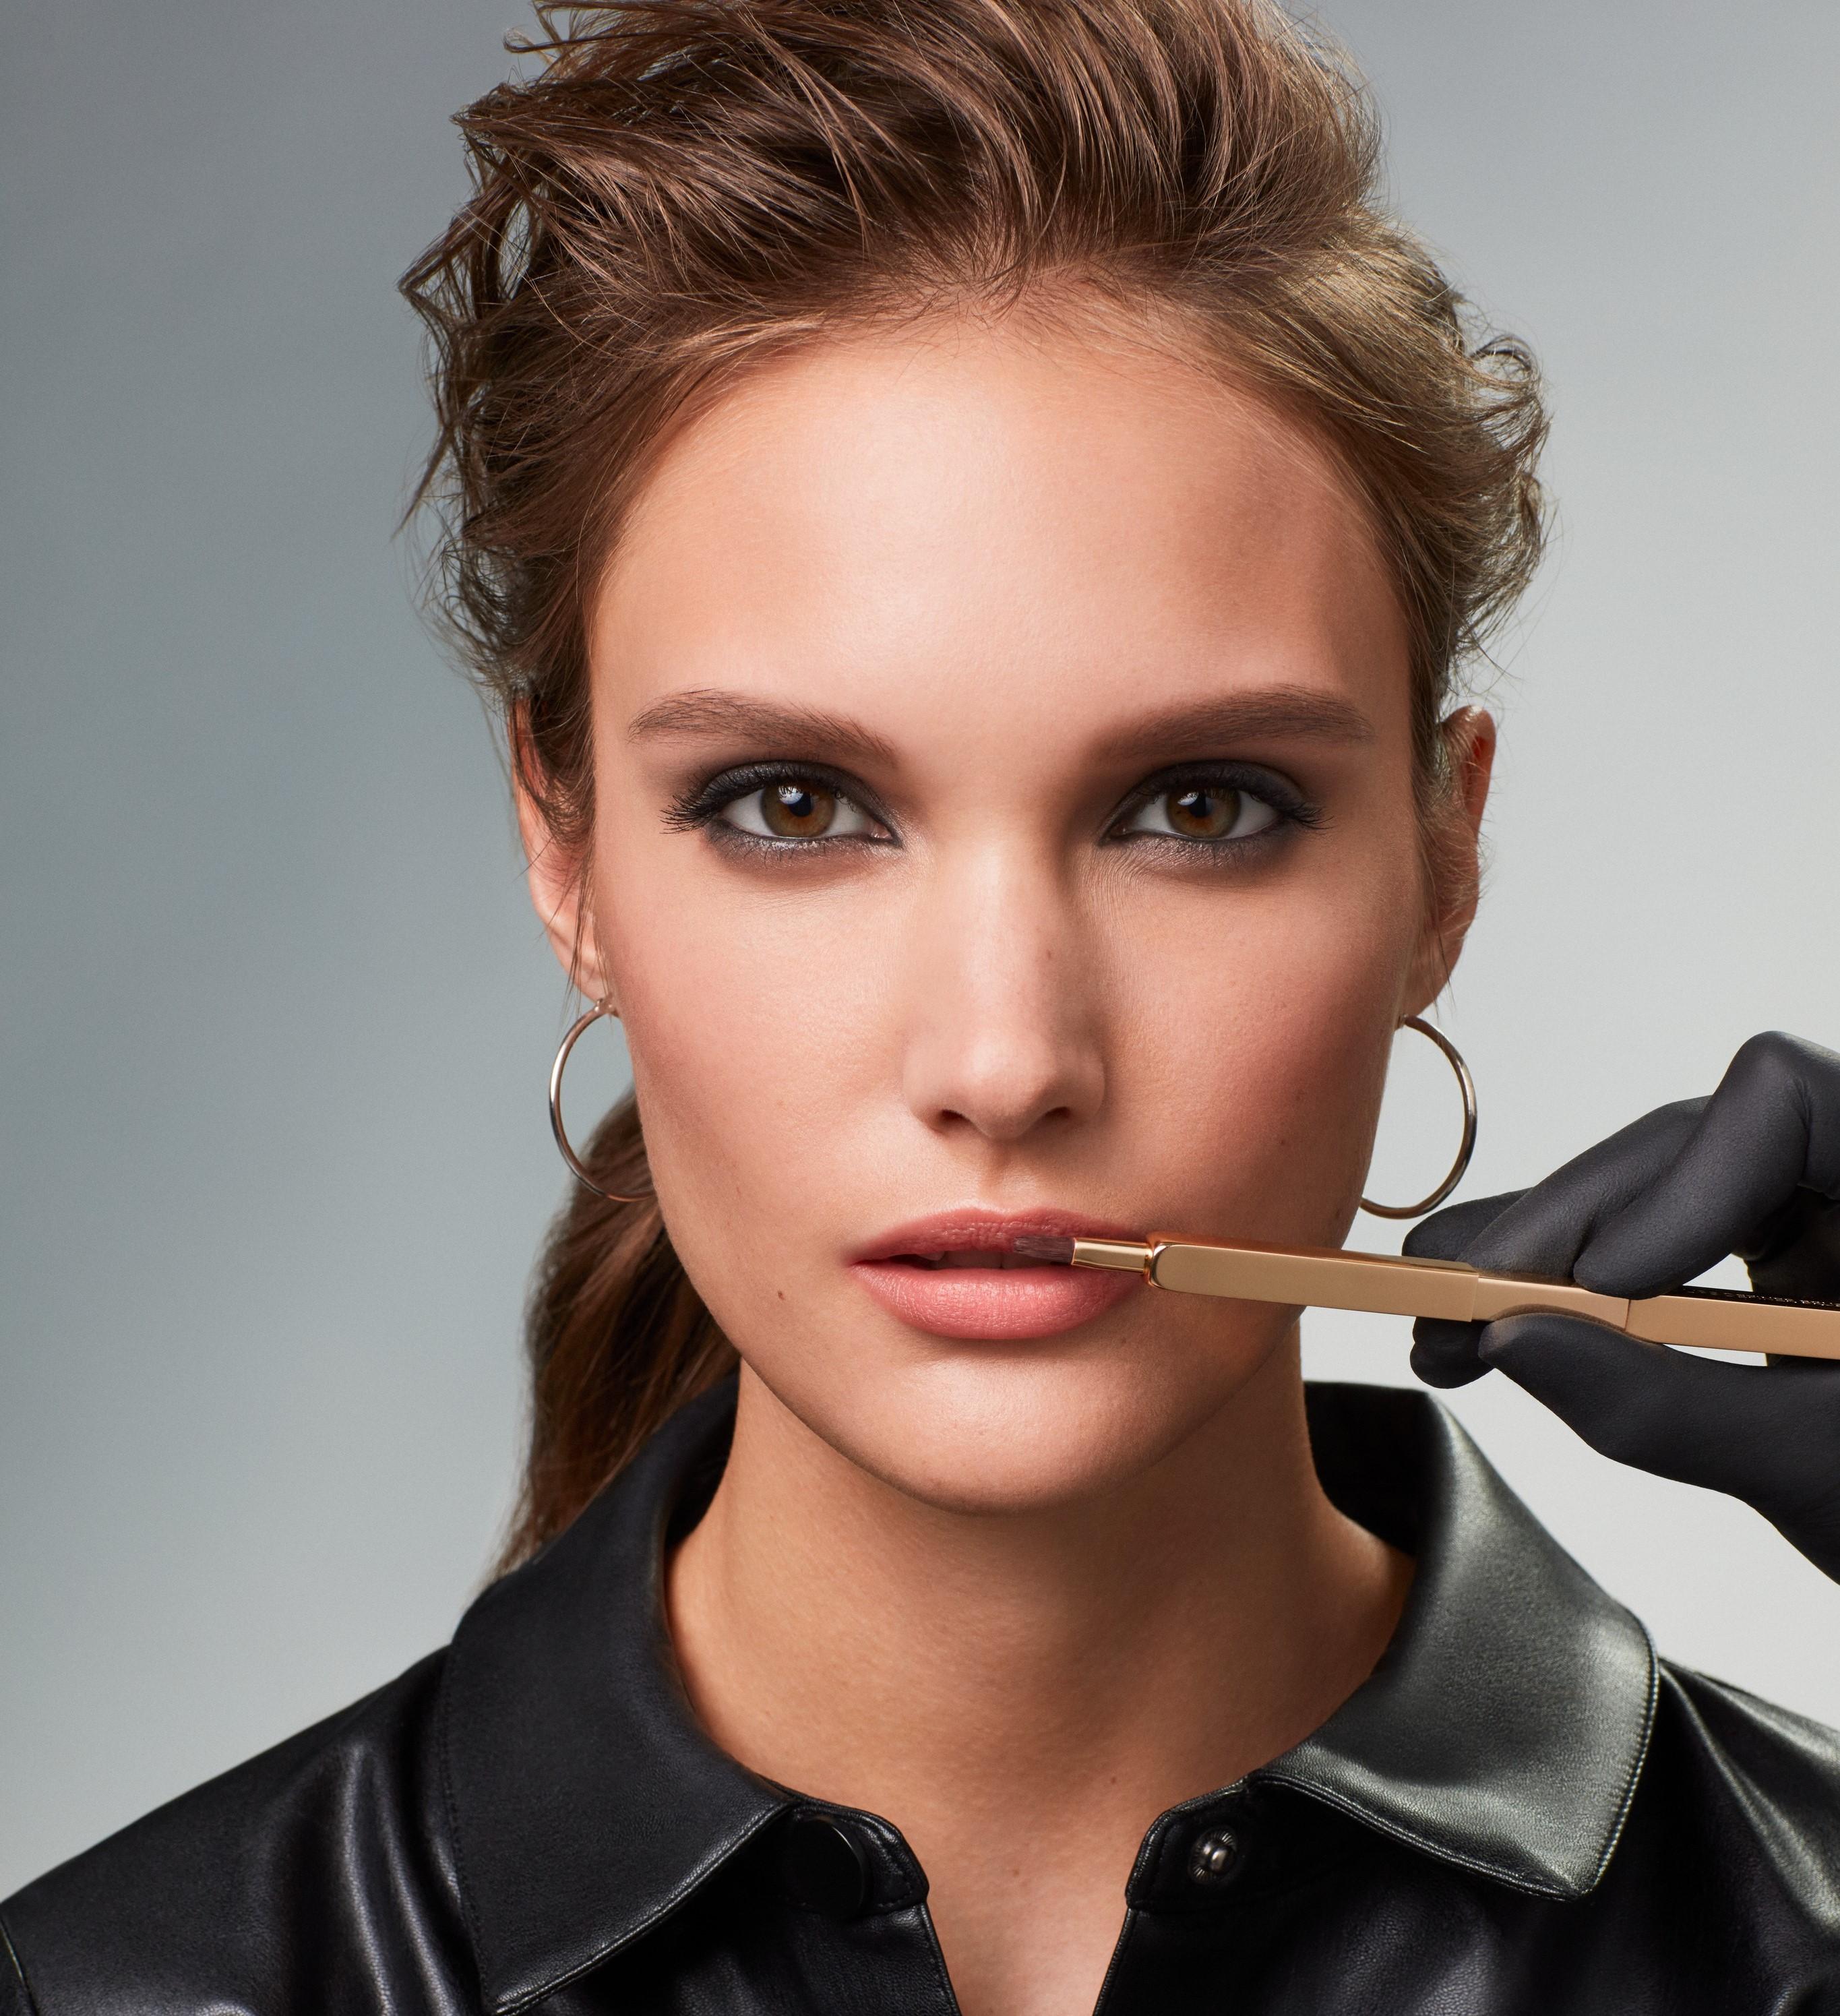 Makeup-application-6-smokey-eyes-062023-Web-Rendition